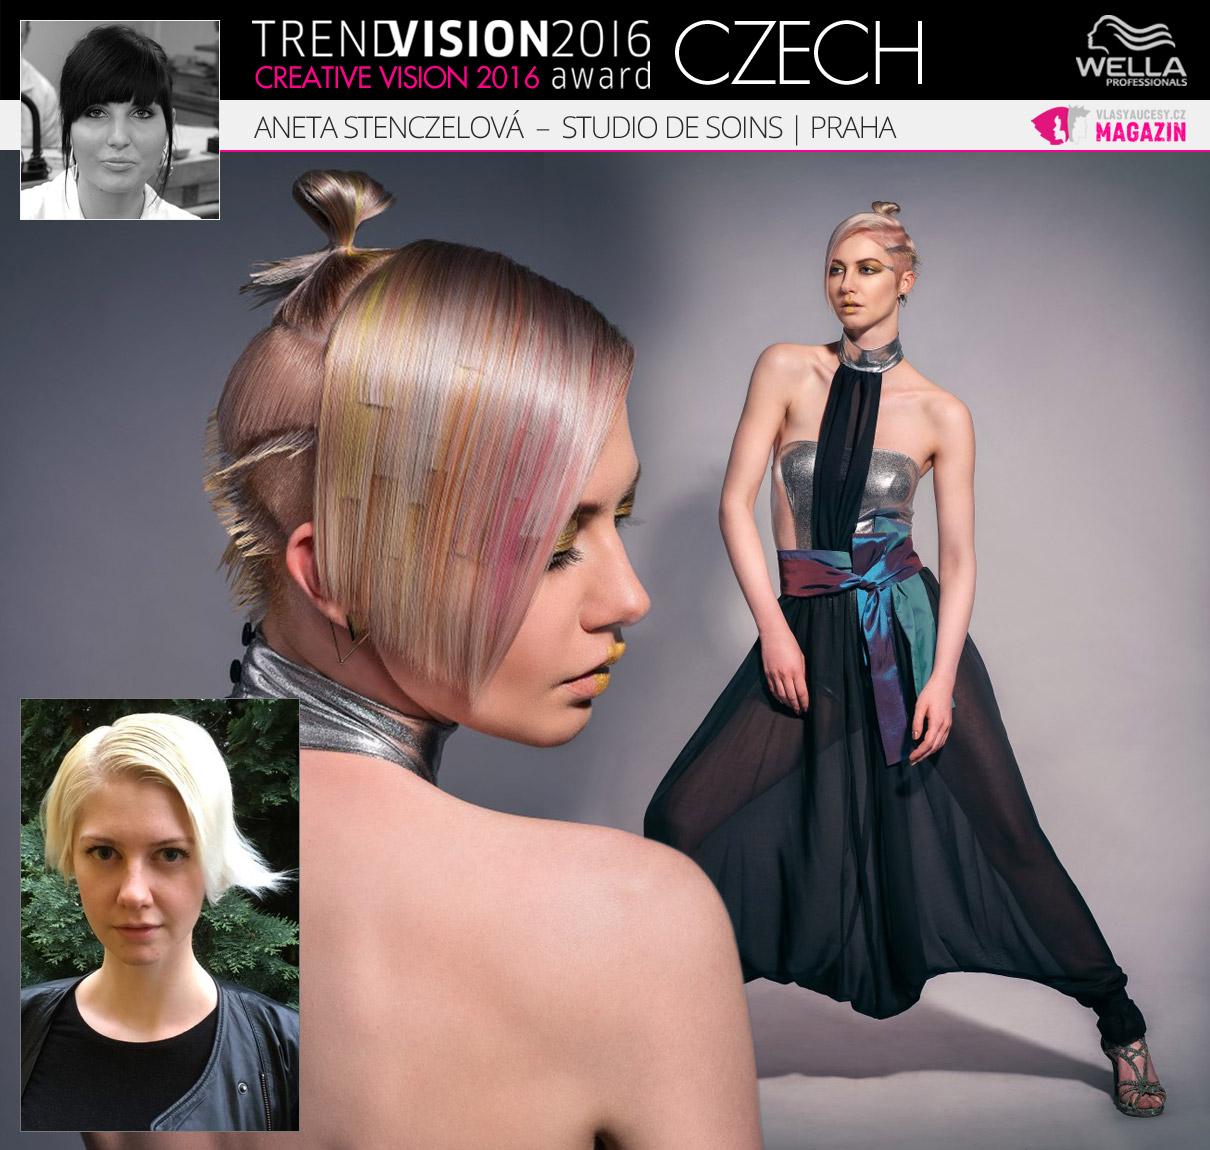 Aneta Stenczelová, Studio de Soins, Praha –Wella Professionals Trend Vision Award Česká republika, kategorie Creative Vision 2016.